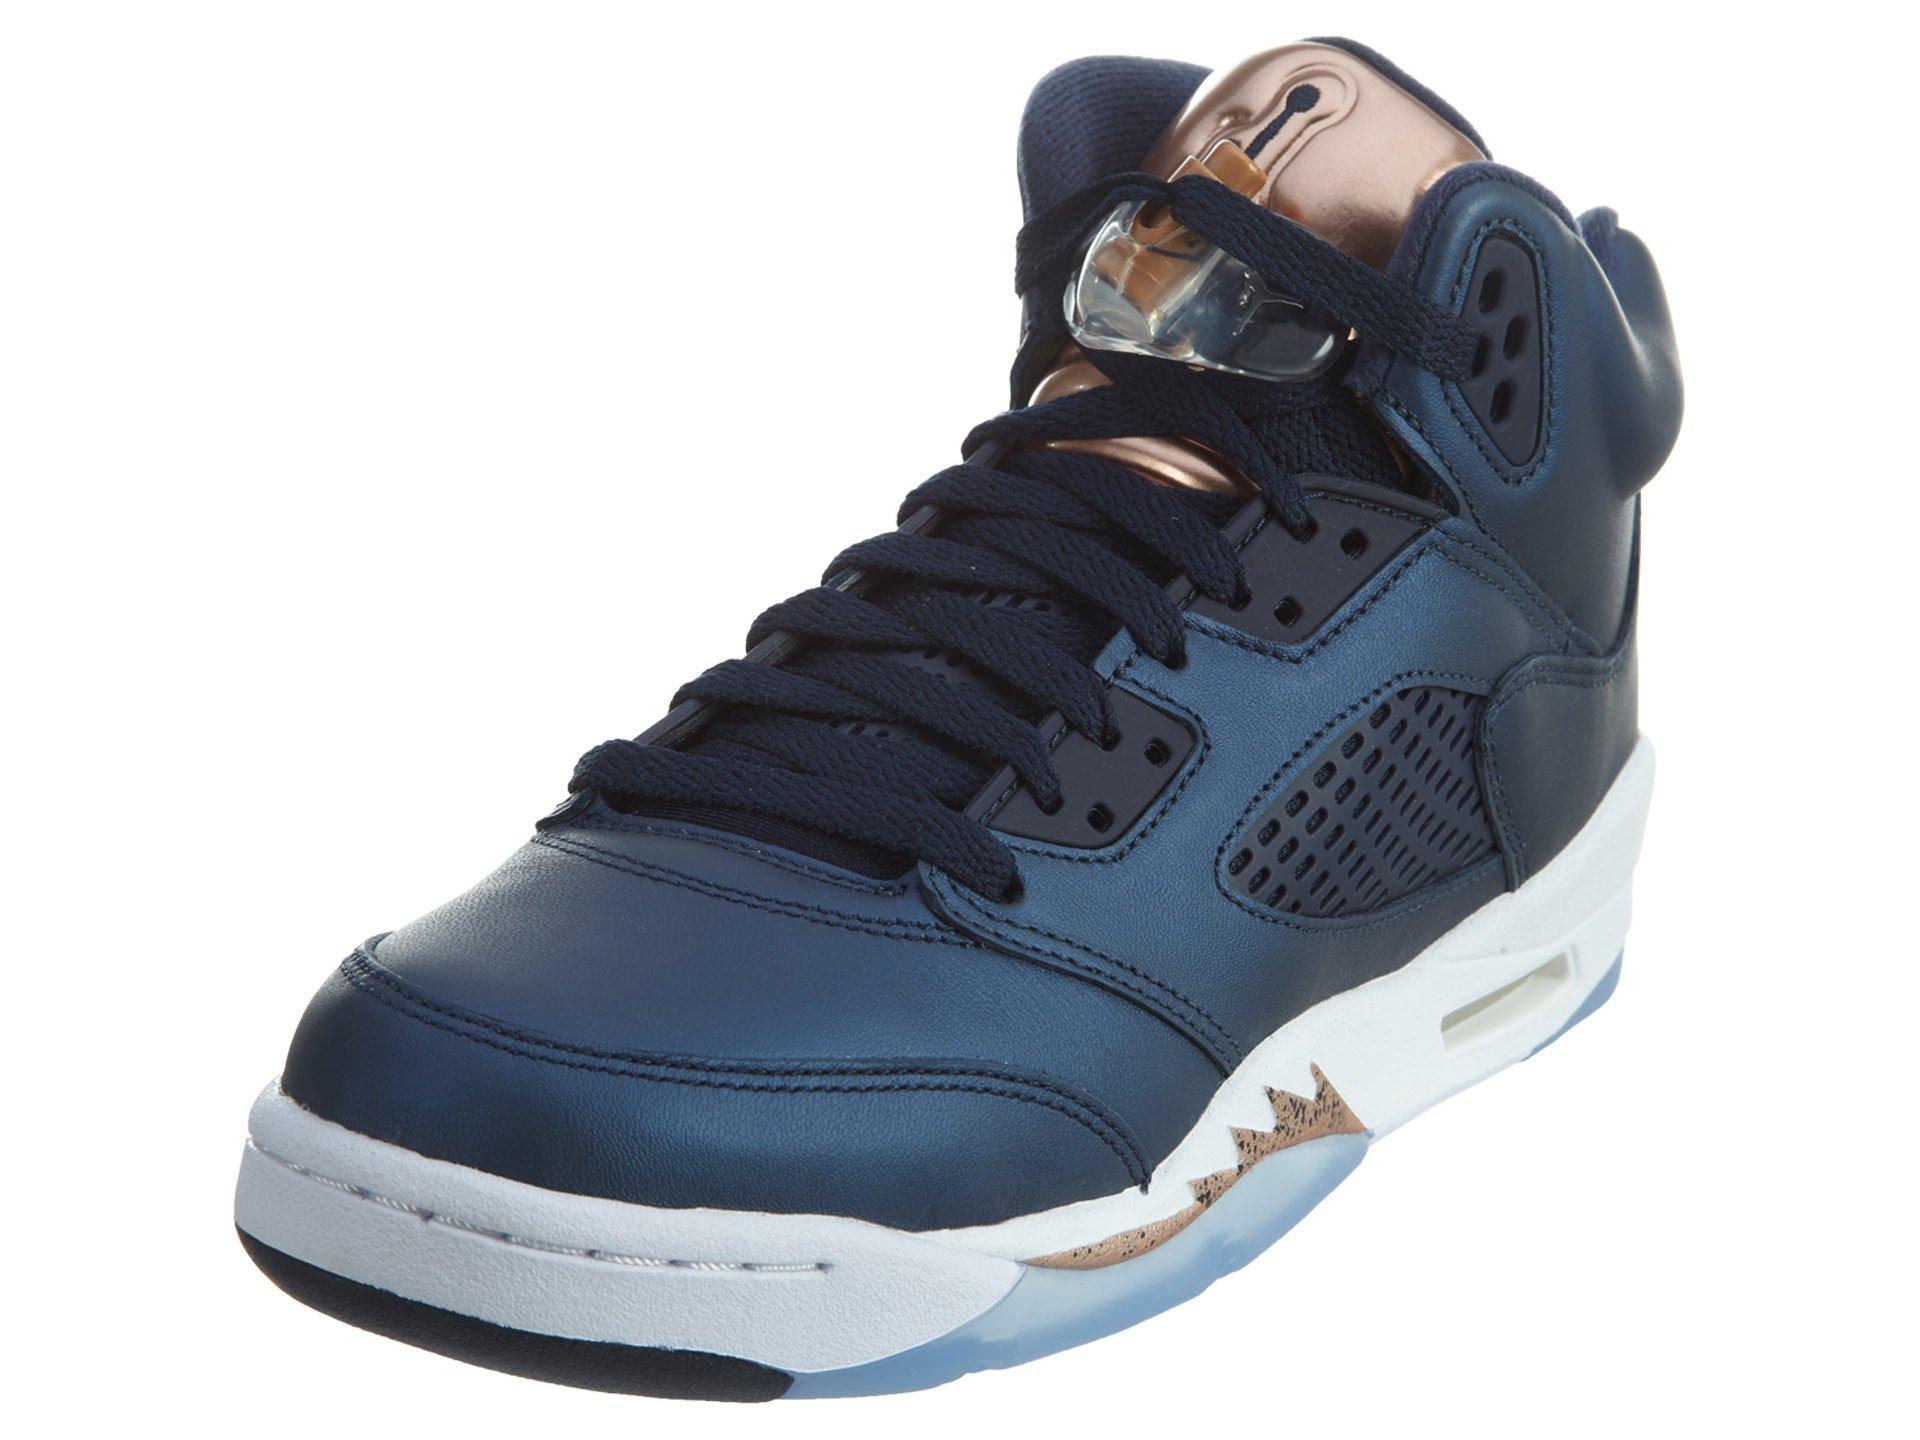 Jordan Nike Kids Air 5 Retro BG Obsdn/Mtlc RD Brnz/Wht Basketball Shoe 5 Kids US